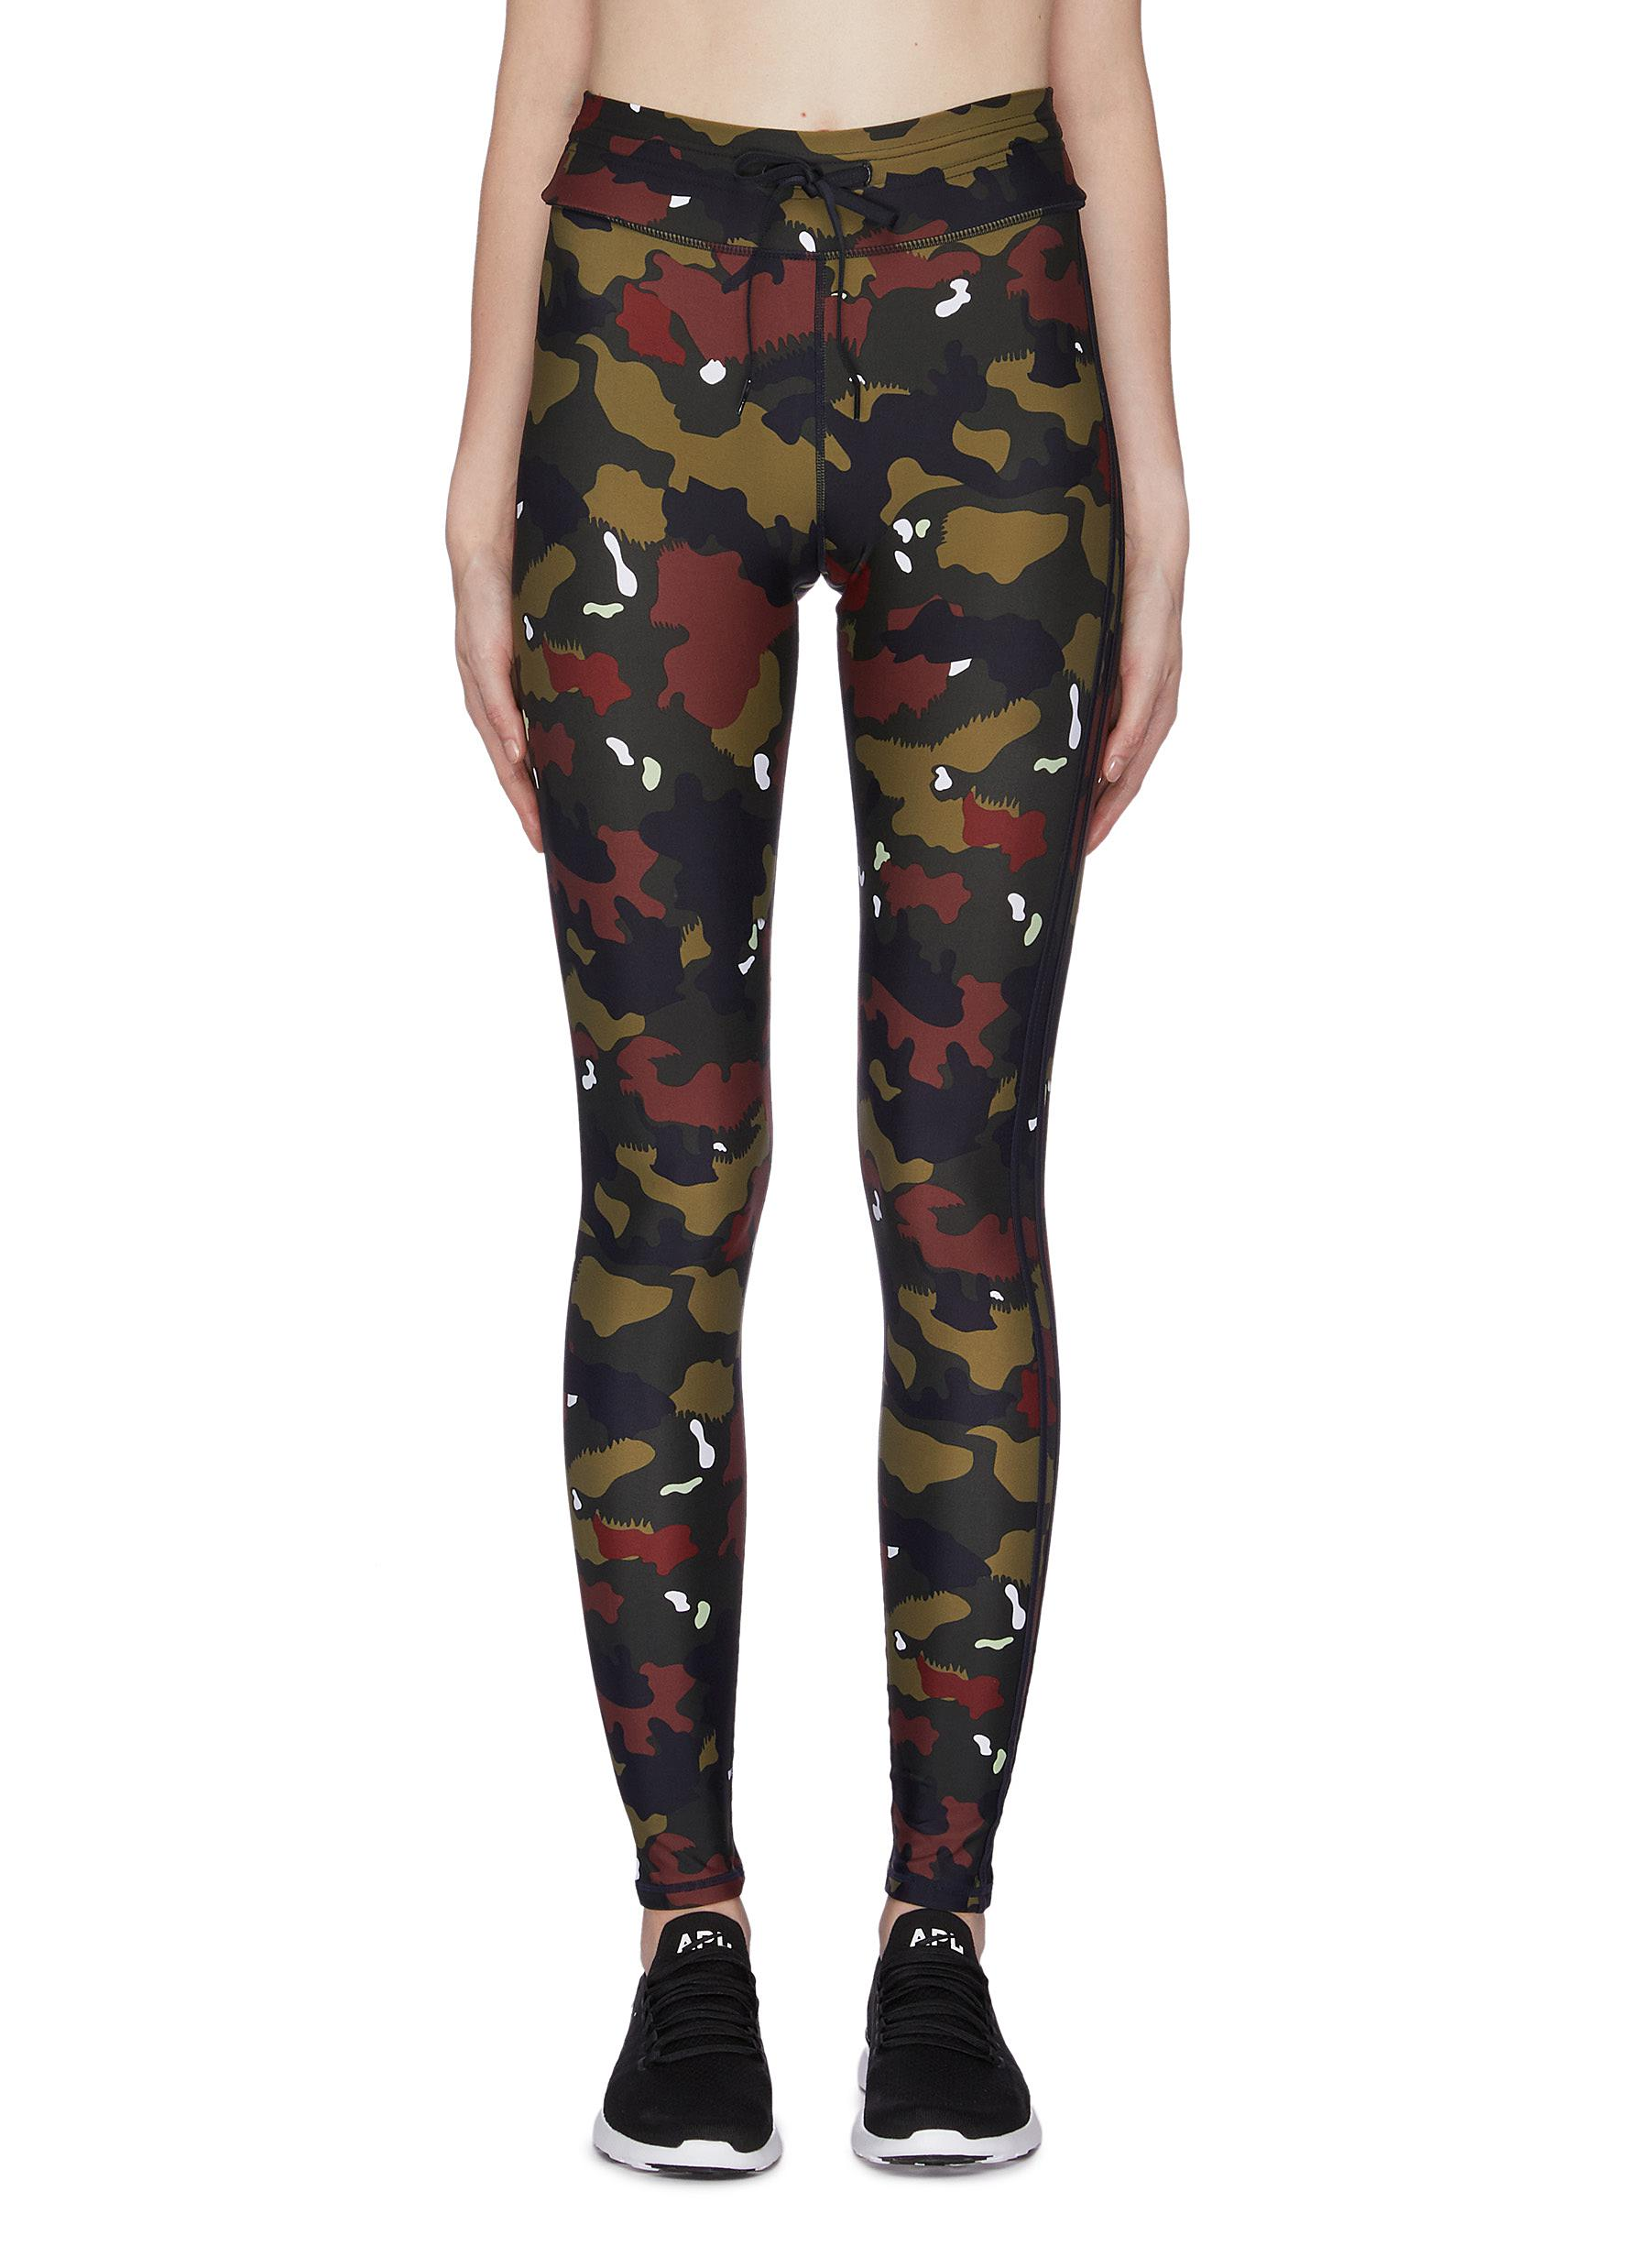 Jungle camoflage print yoga leggings by The Upside